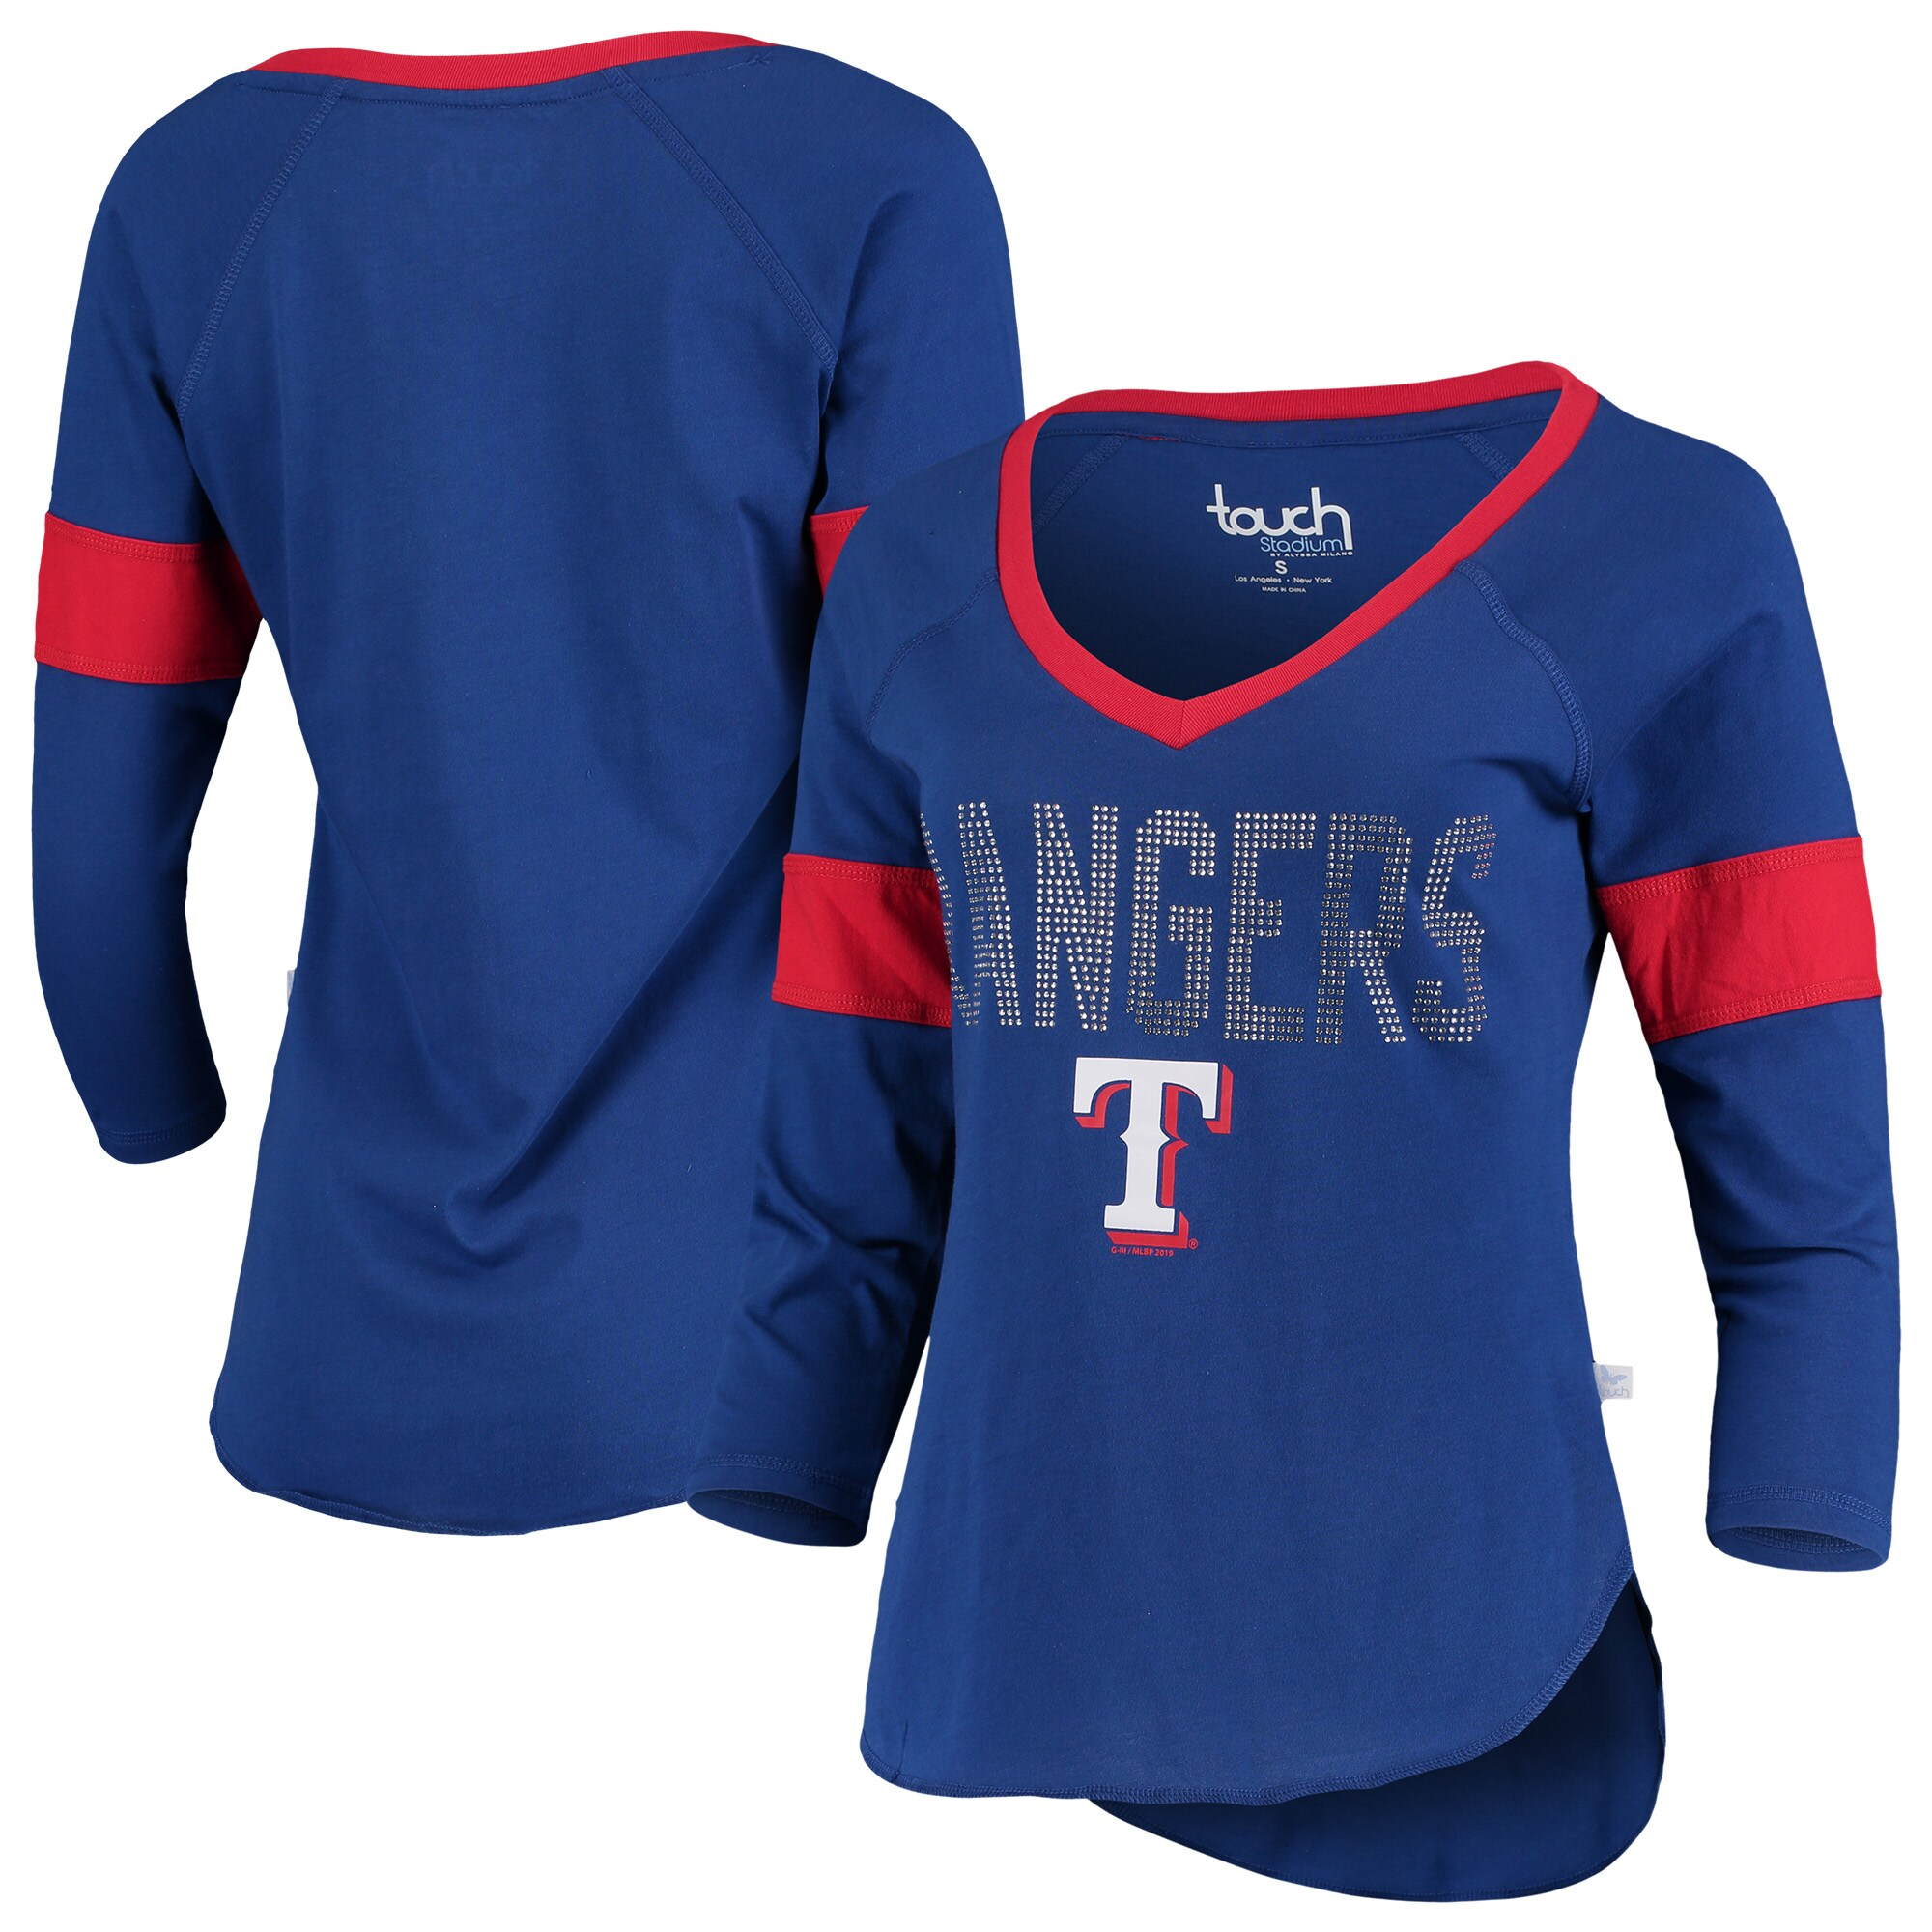 Texas Rangers Touch by Alyssa Milano Women's Ultimate Fan 3/4-Sleeve Raglan V-Neck T-Shirt - Royal